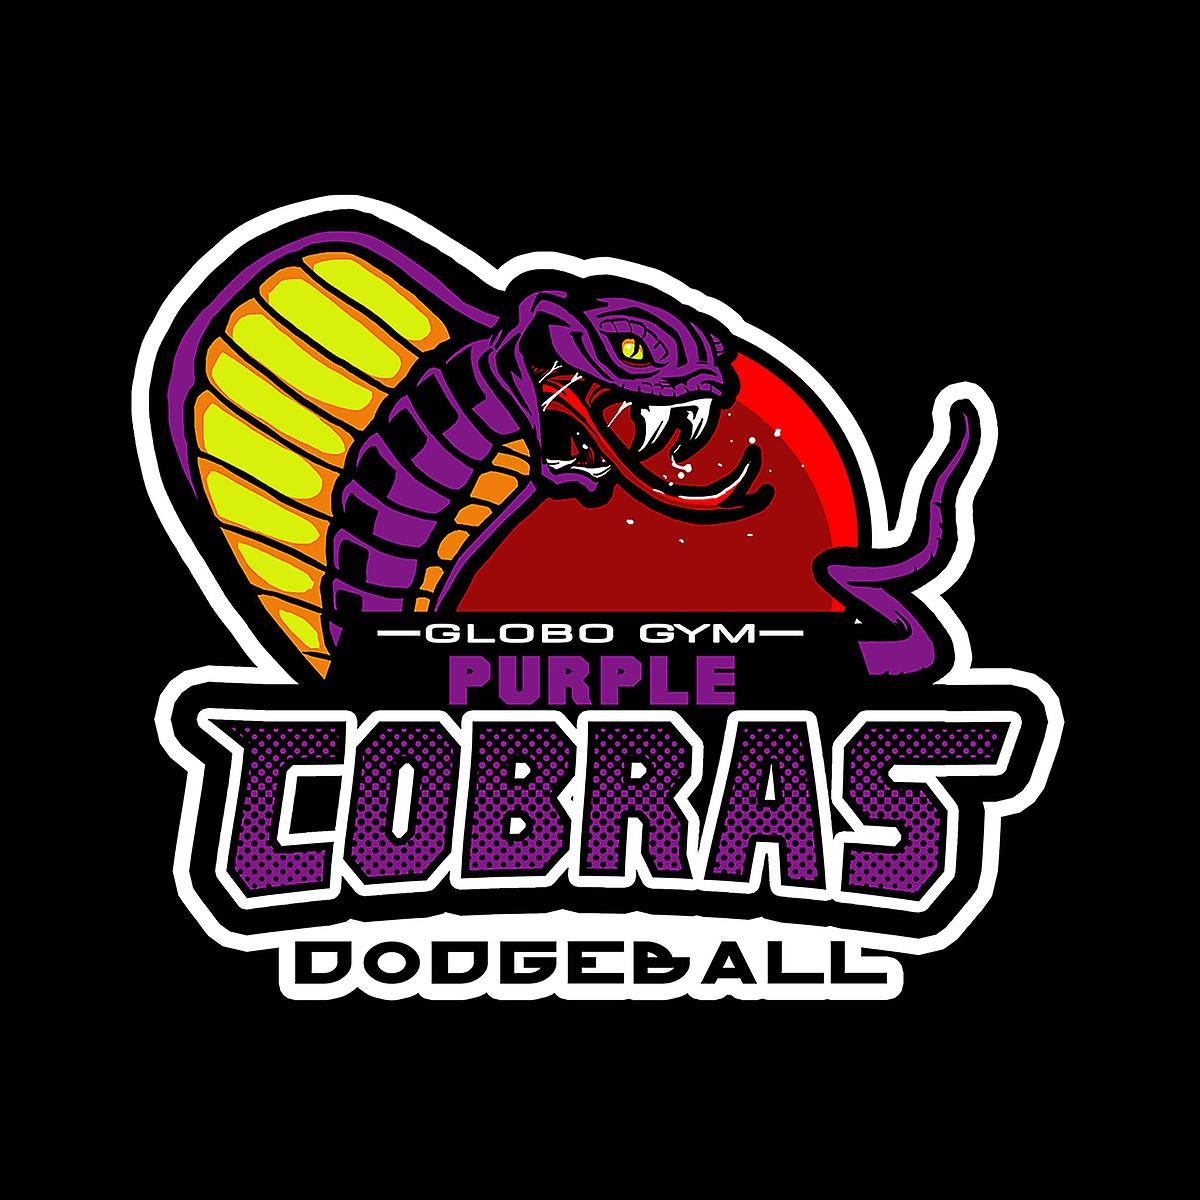 Purple Champs Globo Gym Purple Cobras Dodgeball Women's Sweatshirt